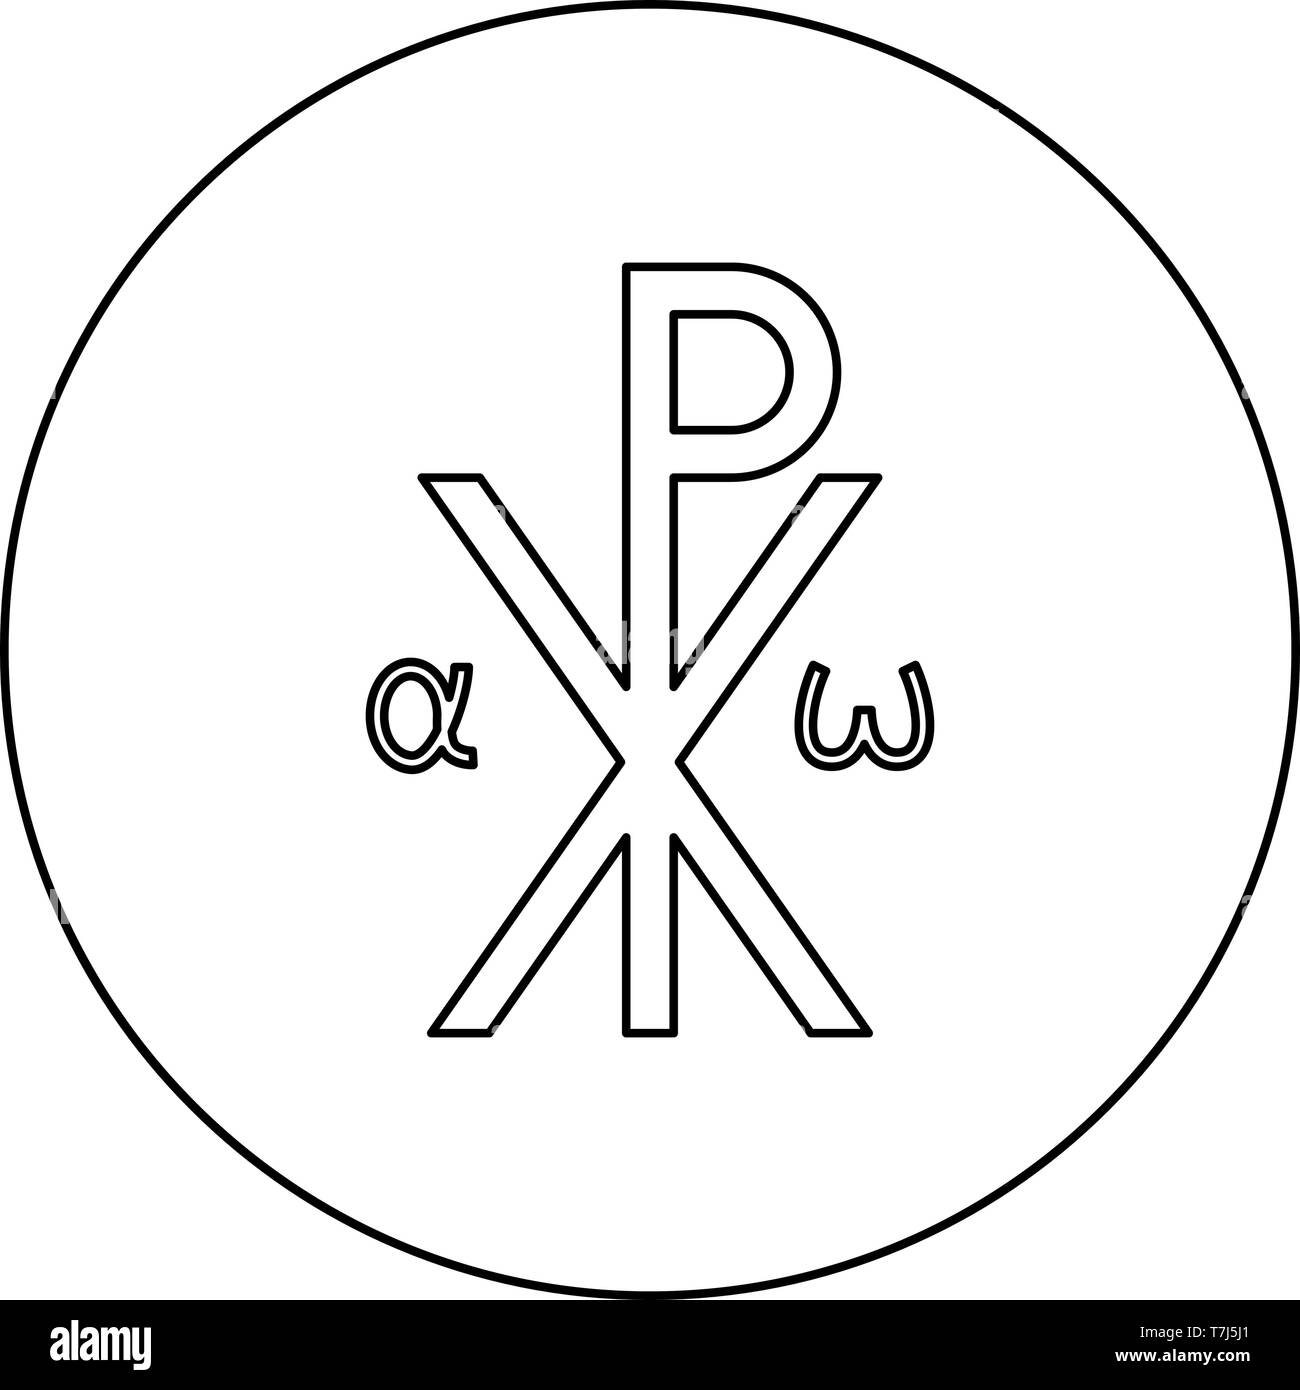 Crismon symbol Cross monogram Xi Hi Ro Konstantin Symbol Saint Pastor sign Religious cross Alfa Omega icon in circle round outline black color vector - Stock Vector